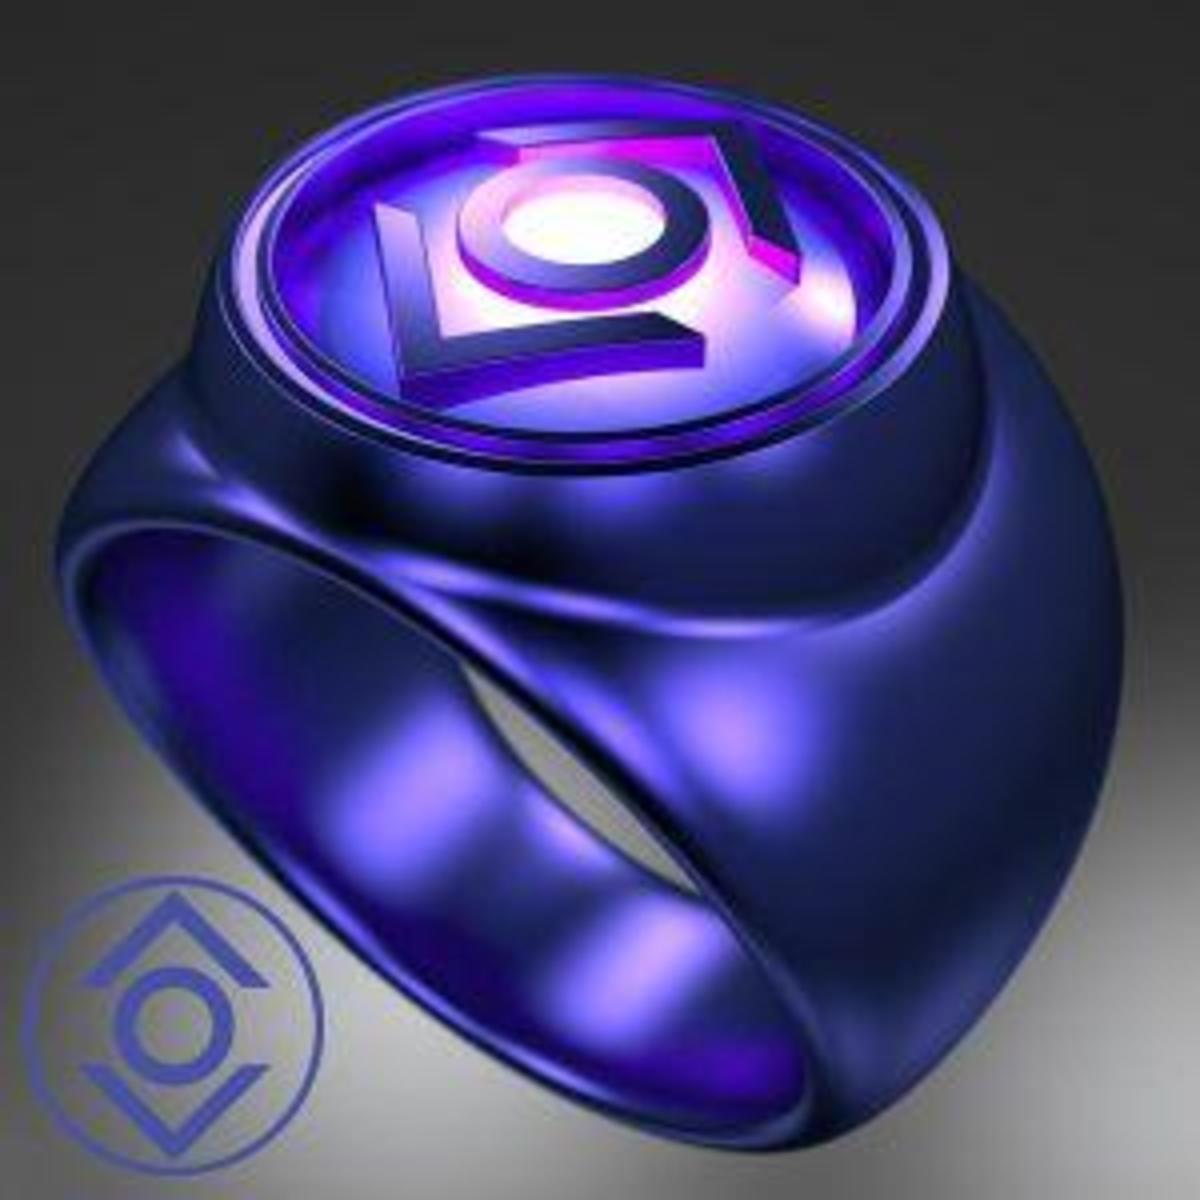 The Indigo Lantern Corps Power Ring